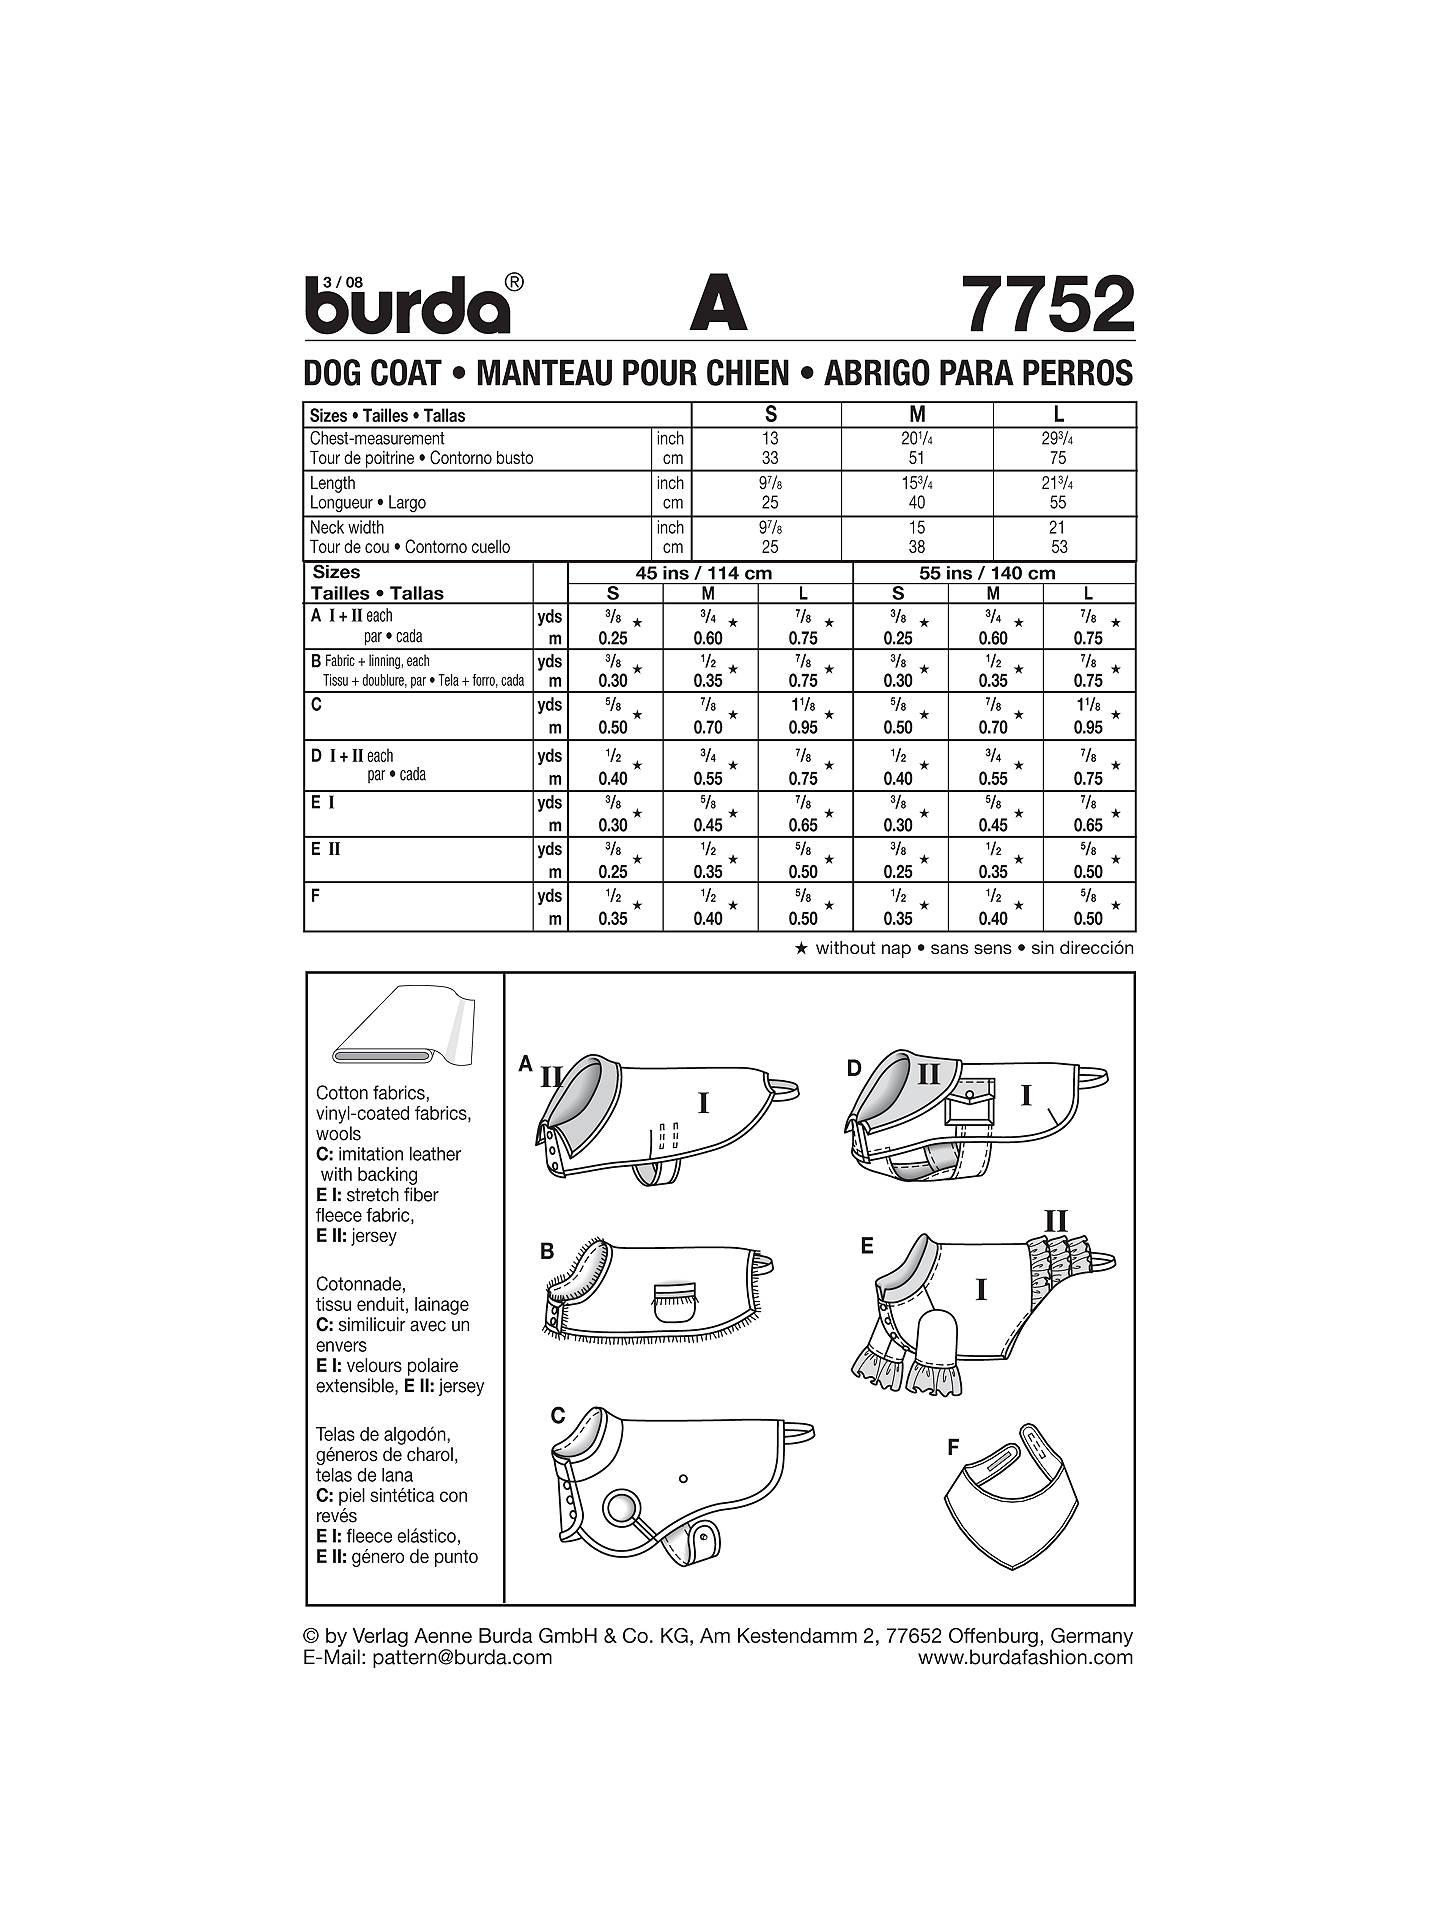 Burda Dog Coat Sewing Pattern, 7752 at John Lewis & Partners